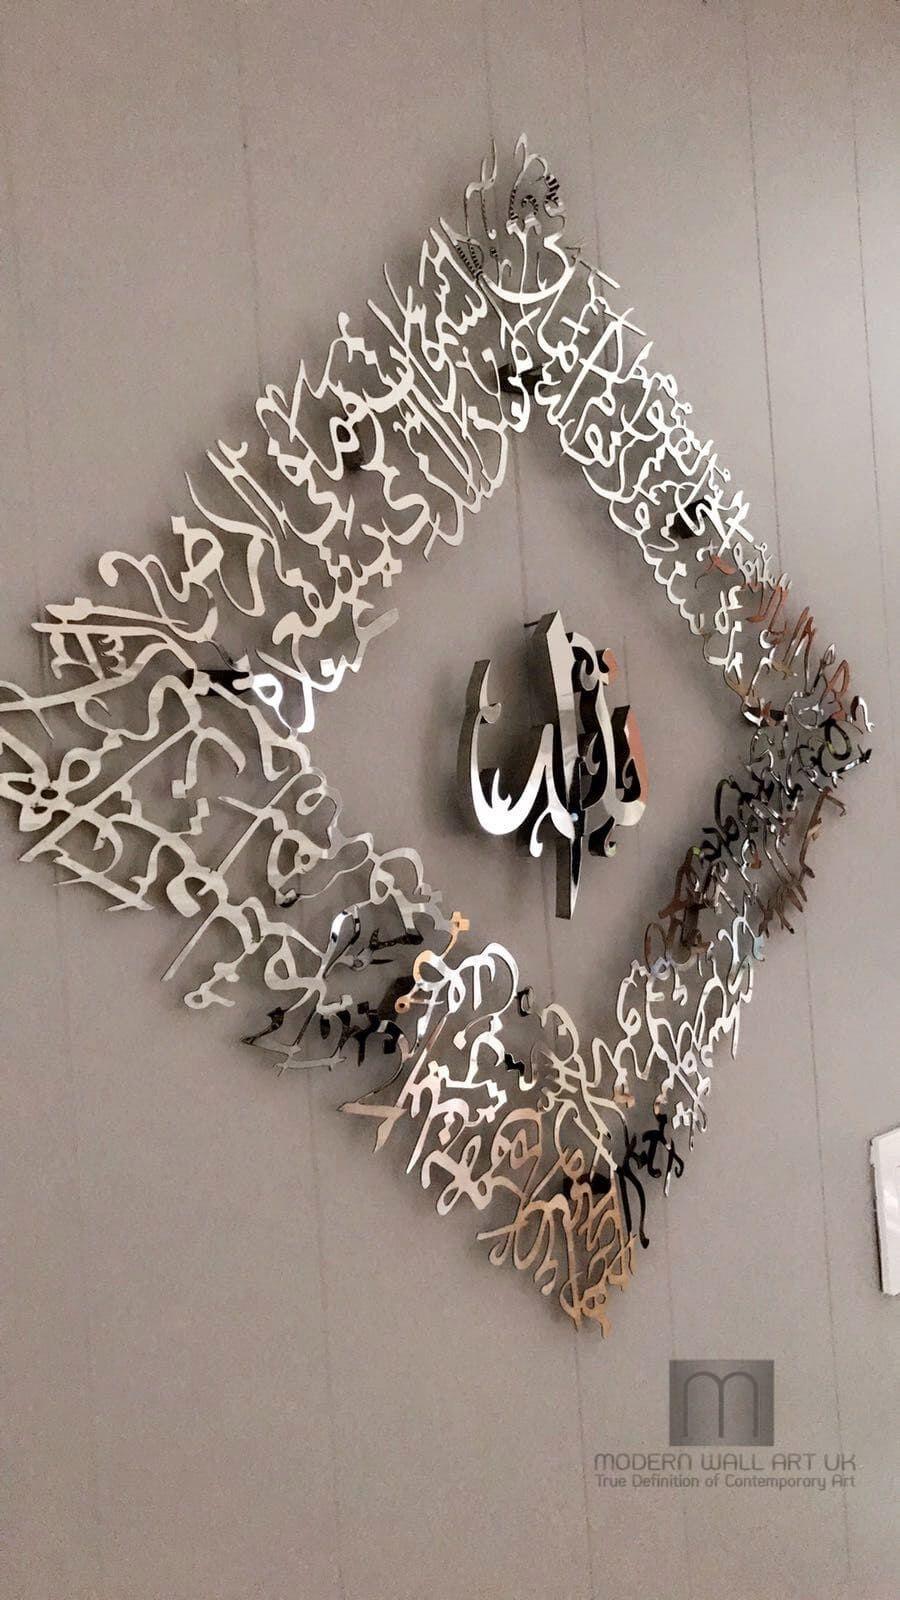 Ayatul Kursi Diamond Wall Art Steel Regular Via Modern Wall Art Uk